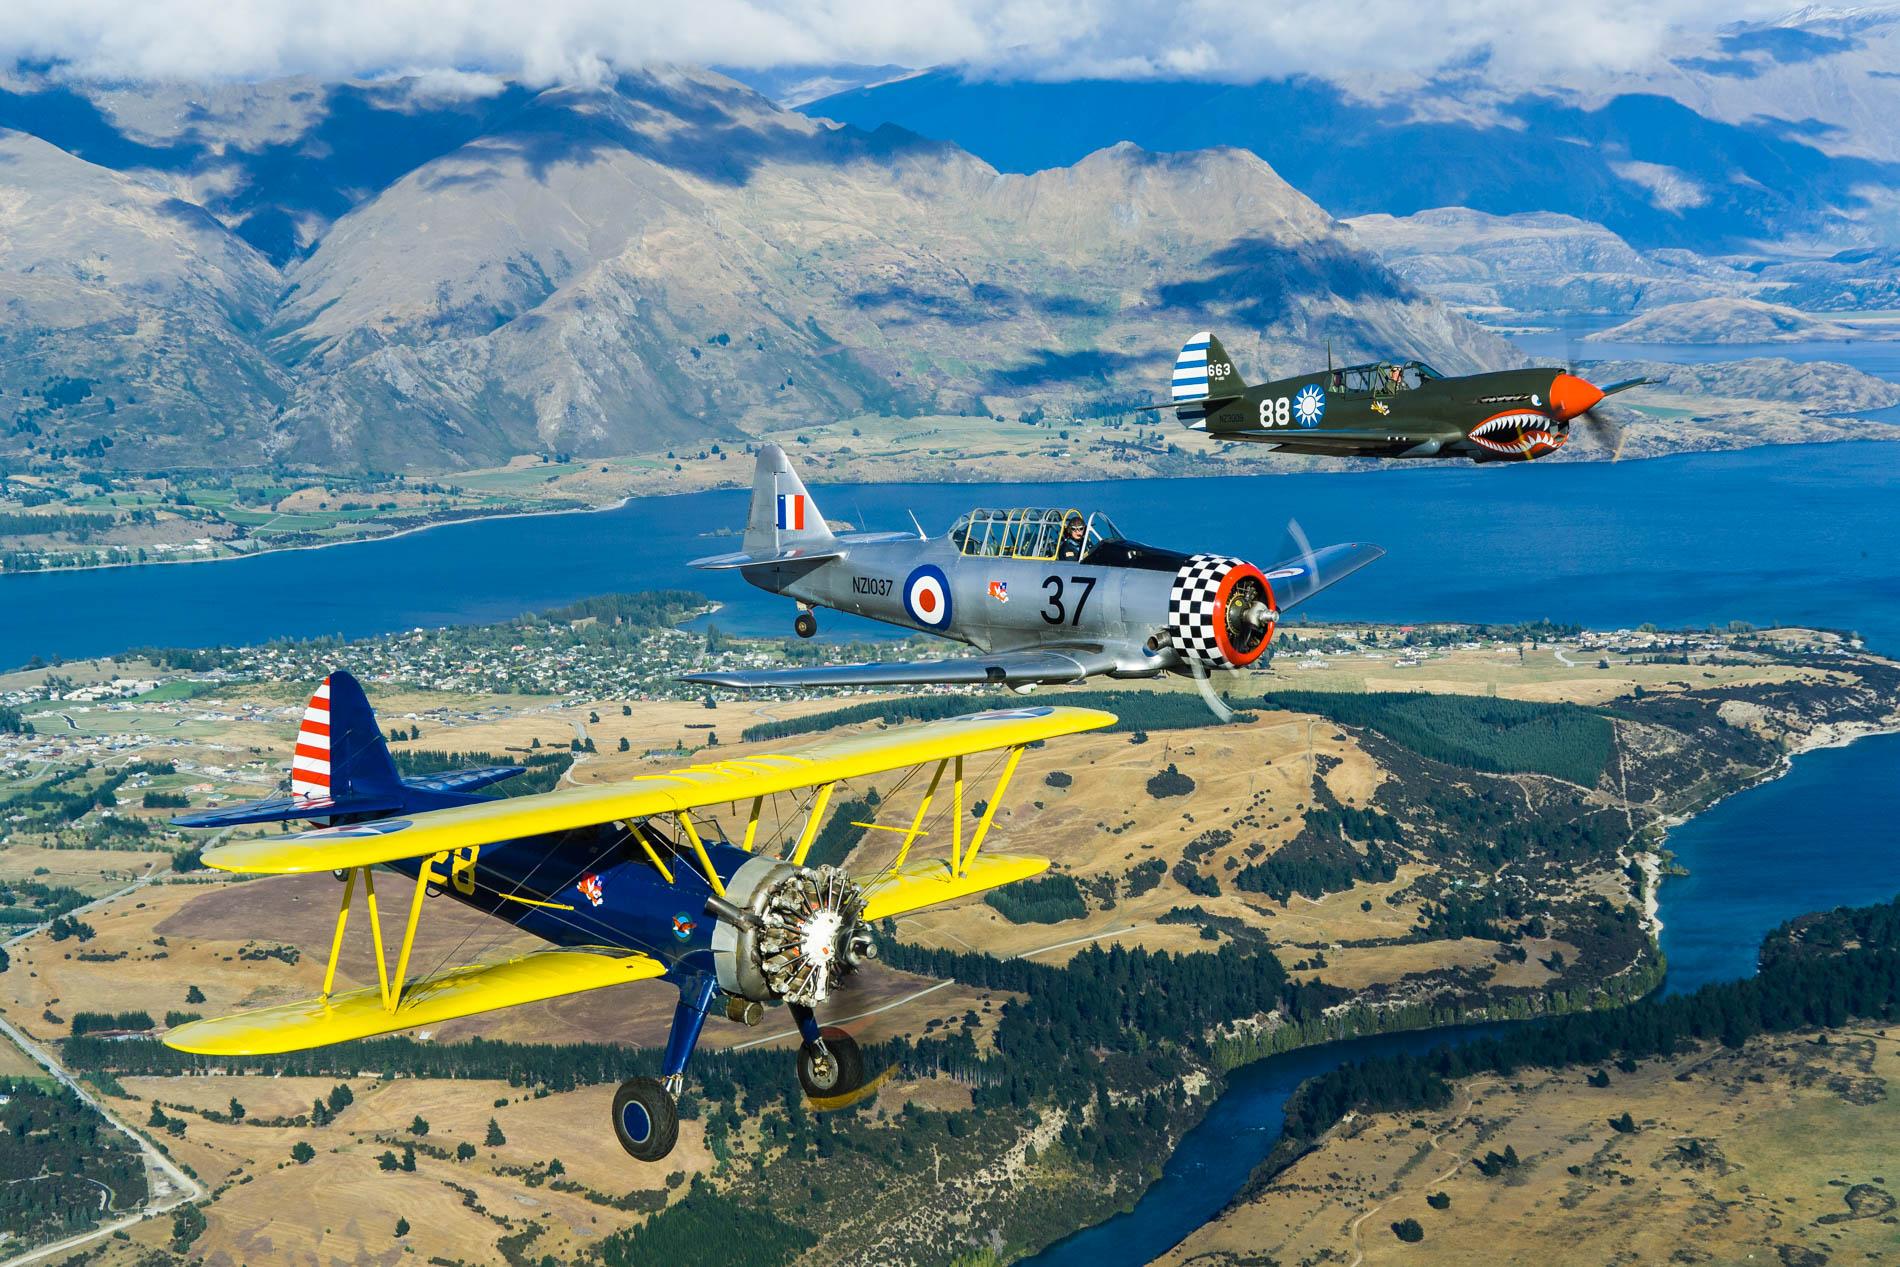 Aeronautica, Air to Air, New Zealand Aotearoa